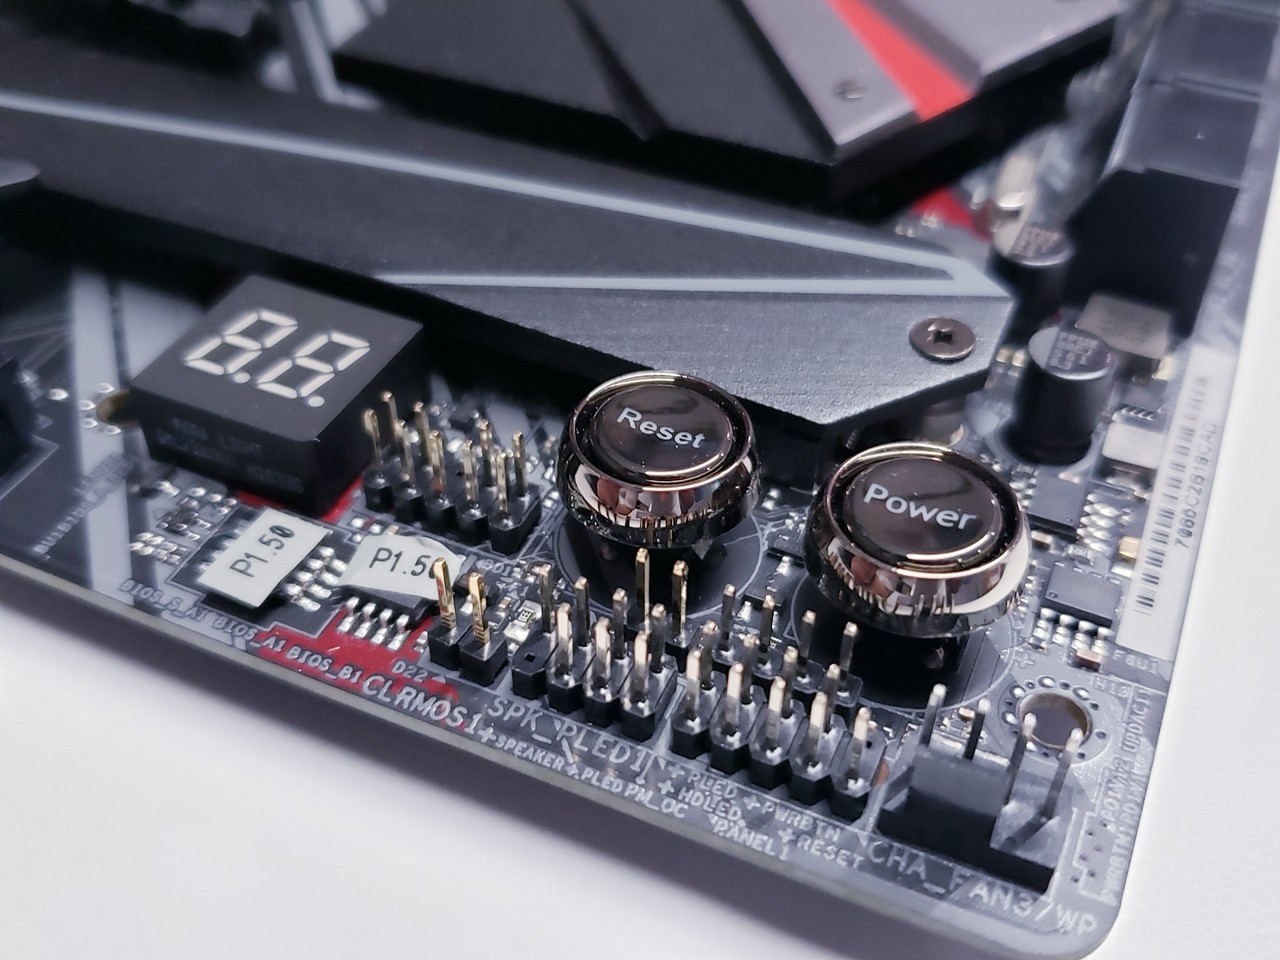 ASRock Z390 Phantom Gaming 9 Motherboard Review - FunkyKit